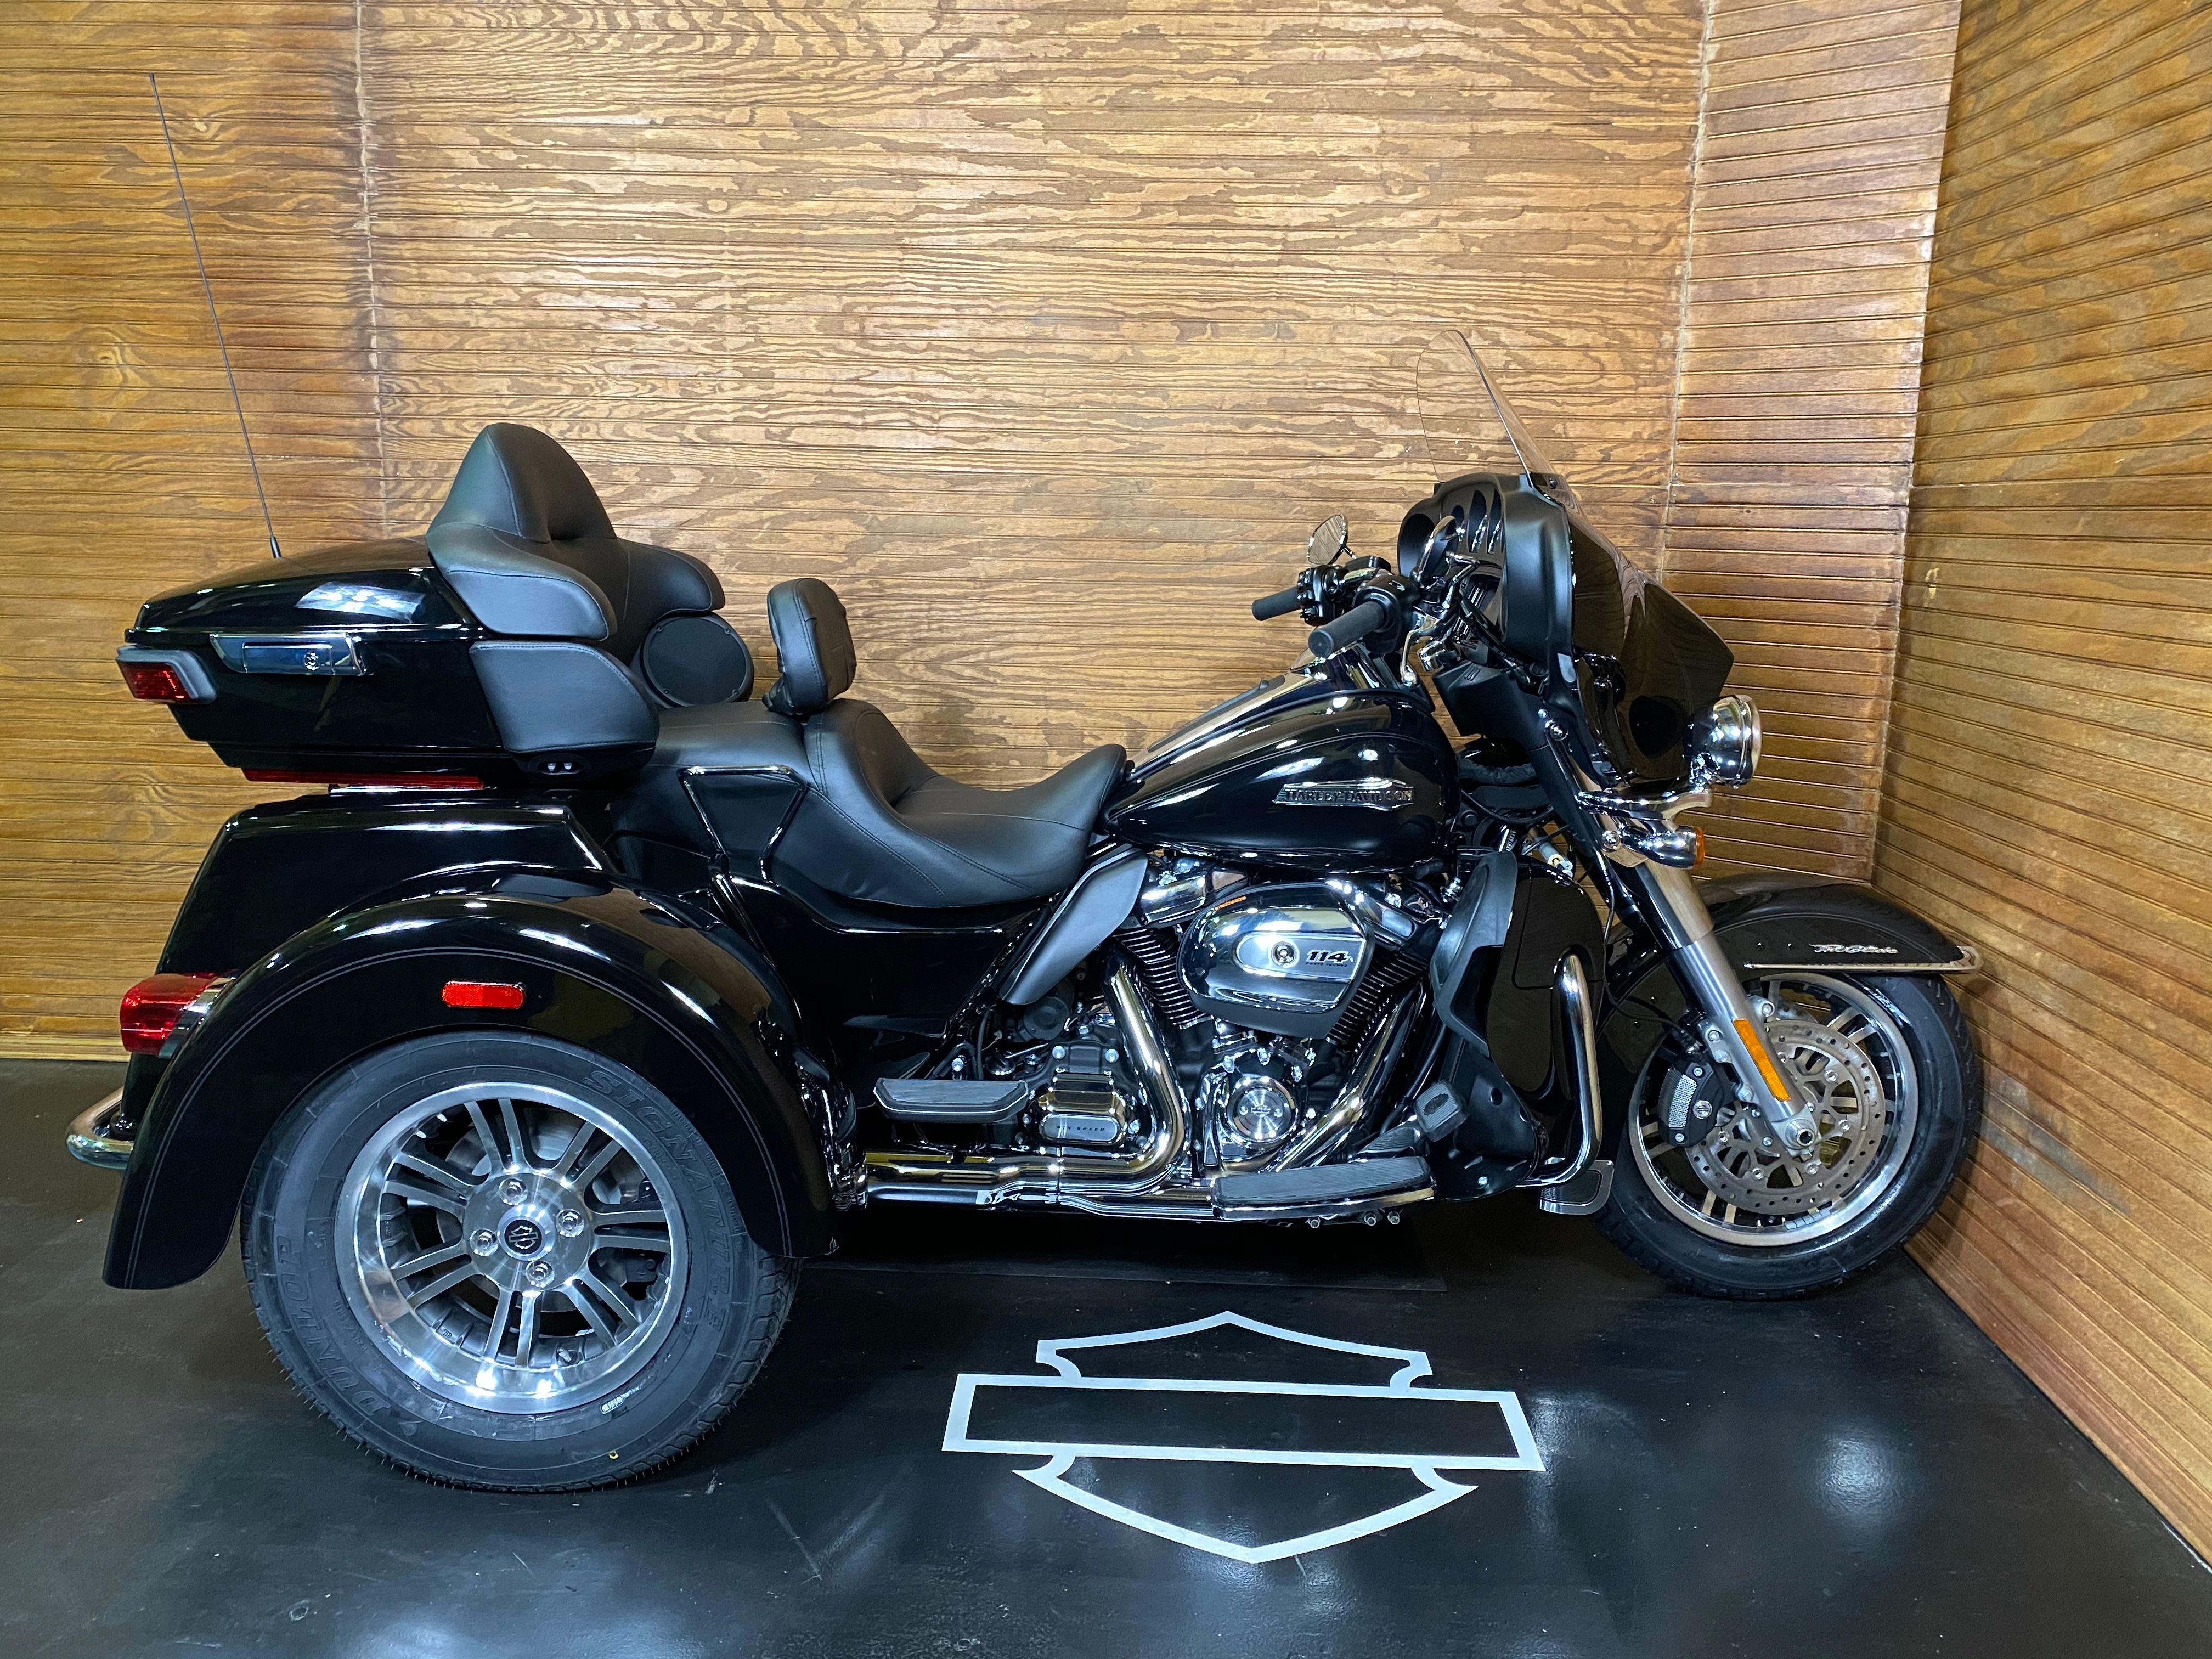 New 2020 Harley-Davidson Tri Glide Ultra